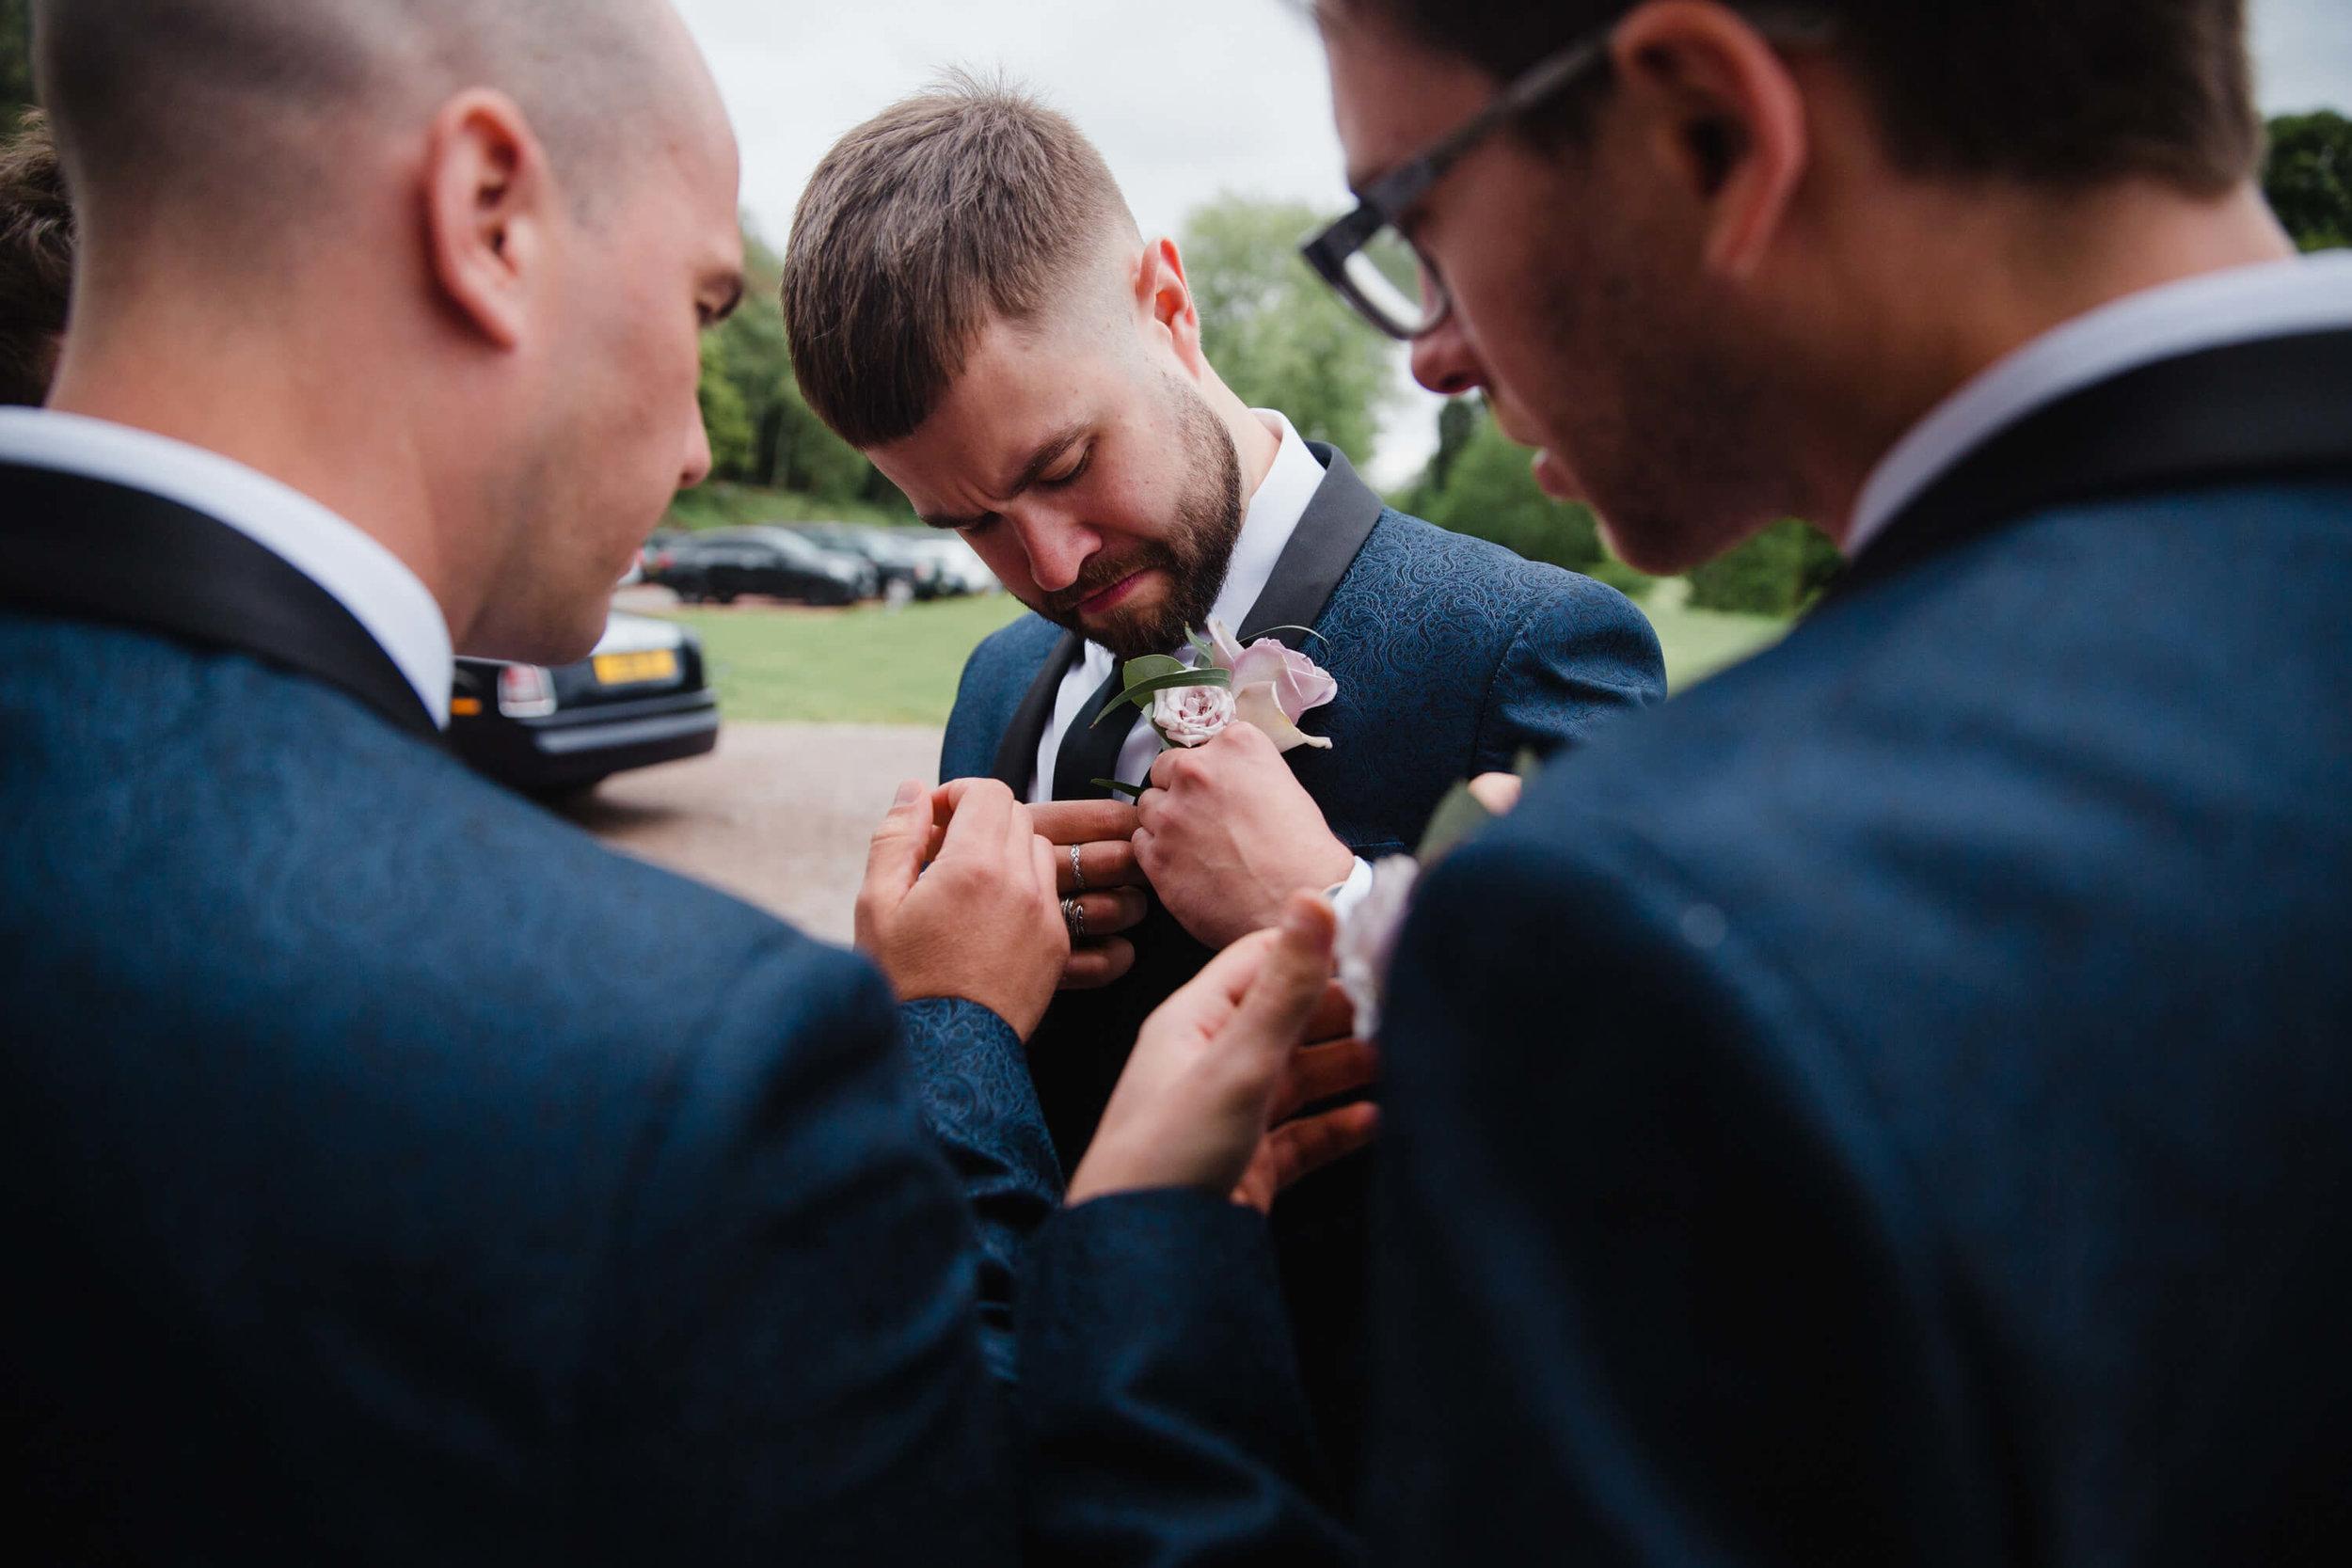 usher fixing button hole flower to jacket lapel